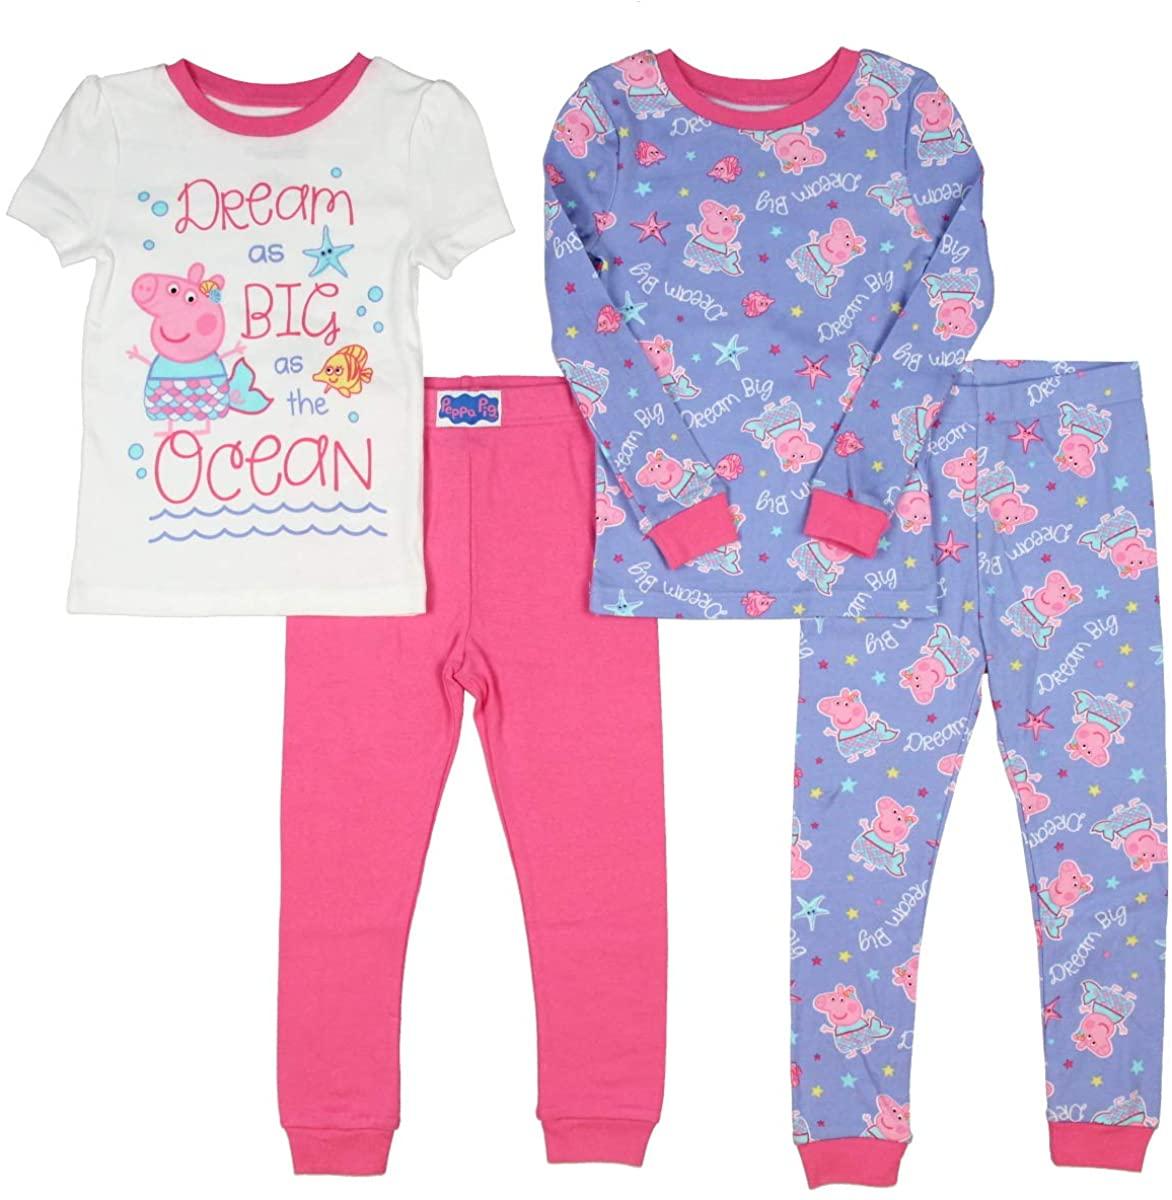 Peppa Pig Toddler Girls Pajamas Dream Big 4pc Mix and Match Sleepwear Set